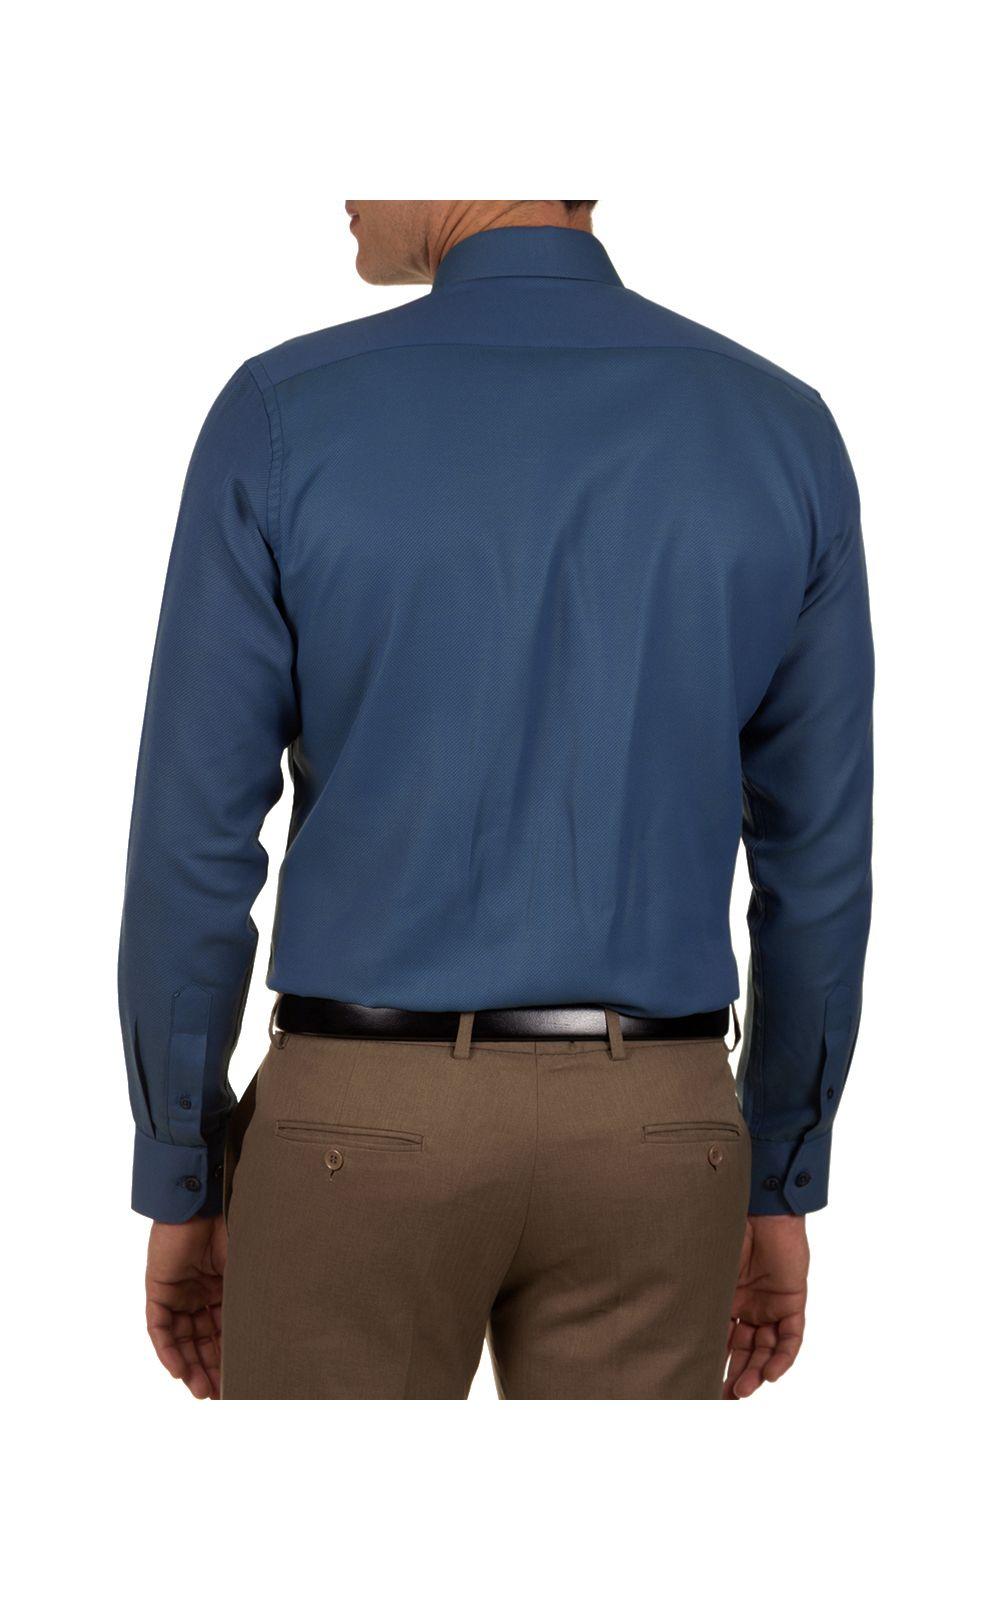 Foto 2 - Camisa Social Masculina Azul Escuro Lisa